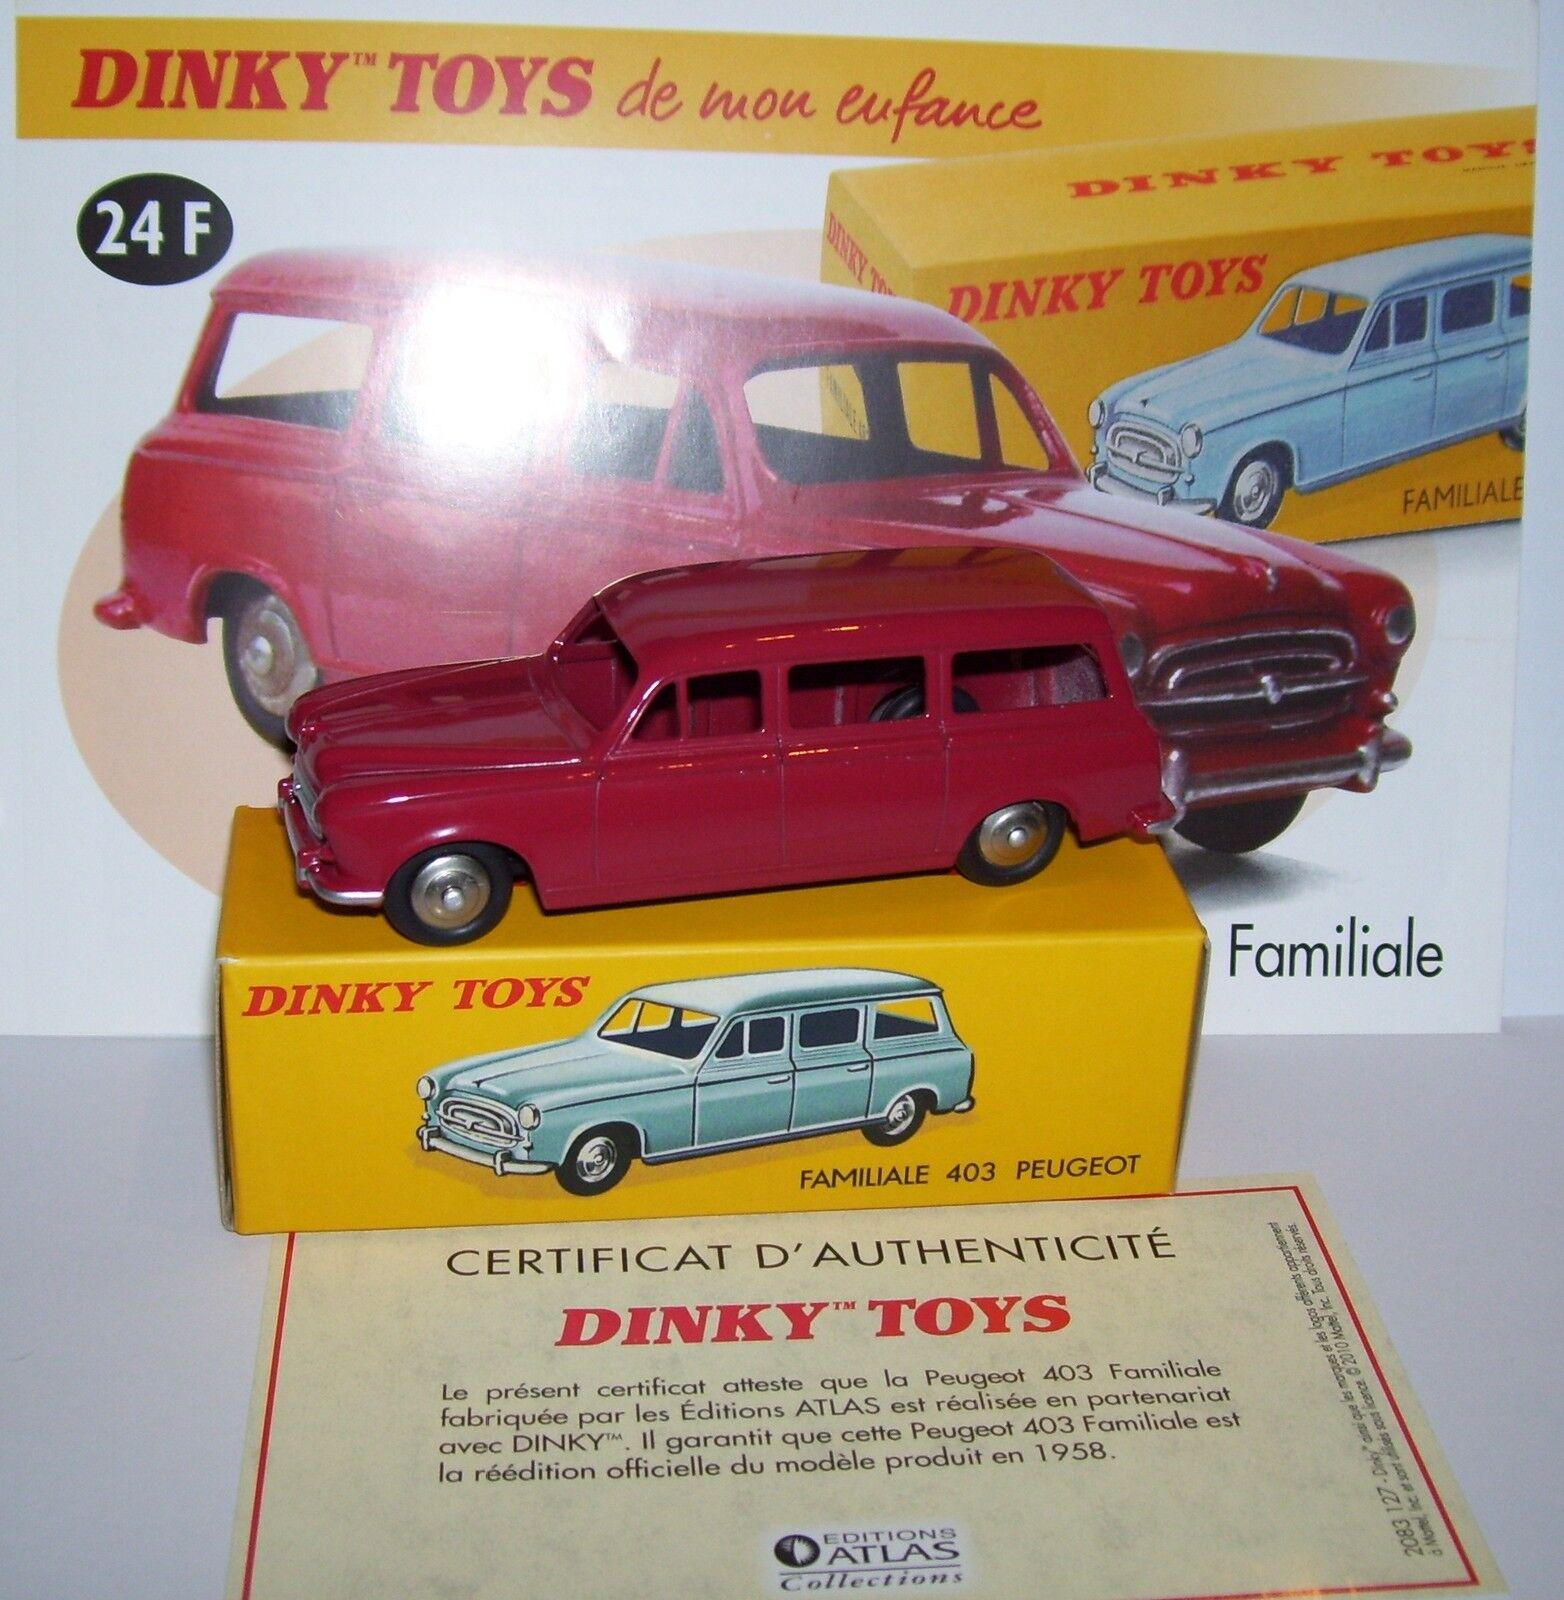 DINKY TOYS ATLAS PEUGEOT 403 FAMILY RED 1 43 43 43 REF 24F IN BOX 70b1d7